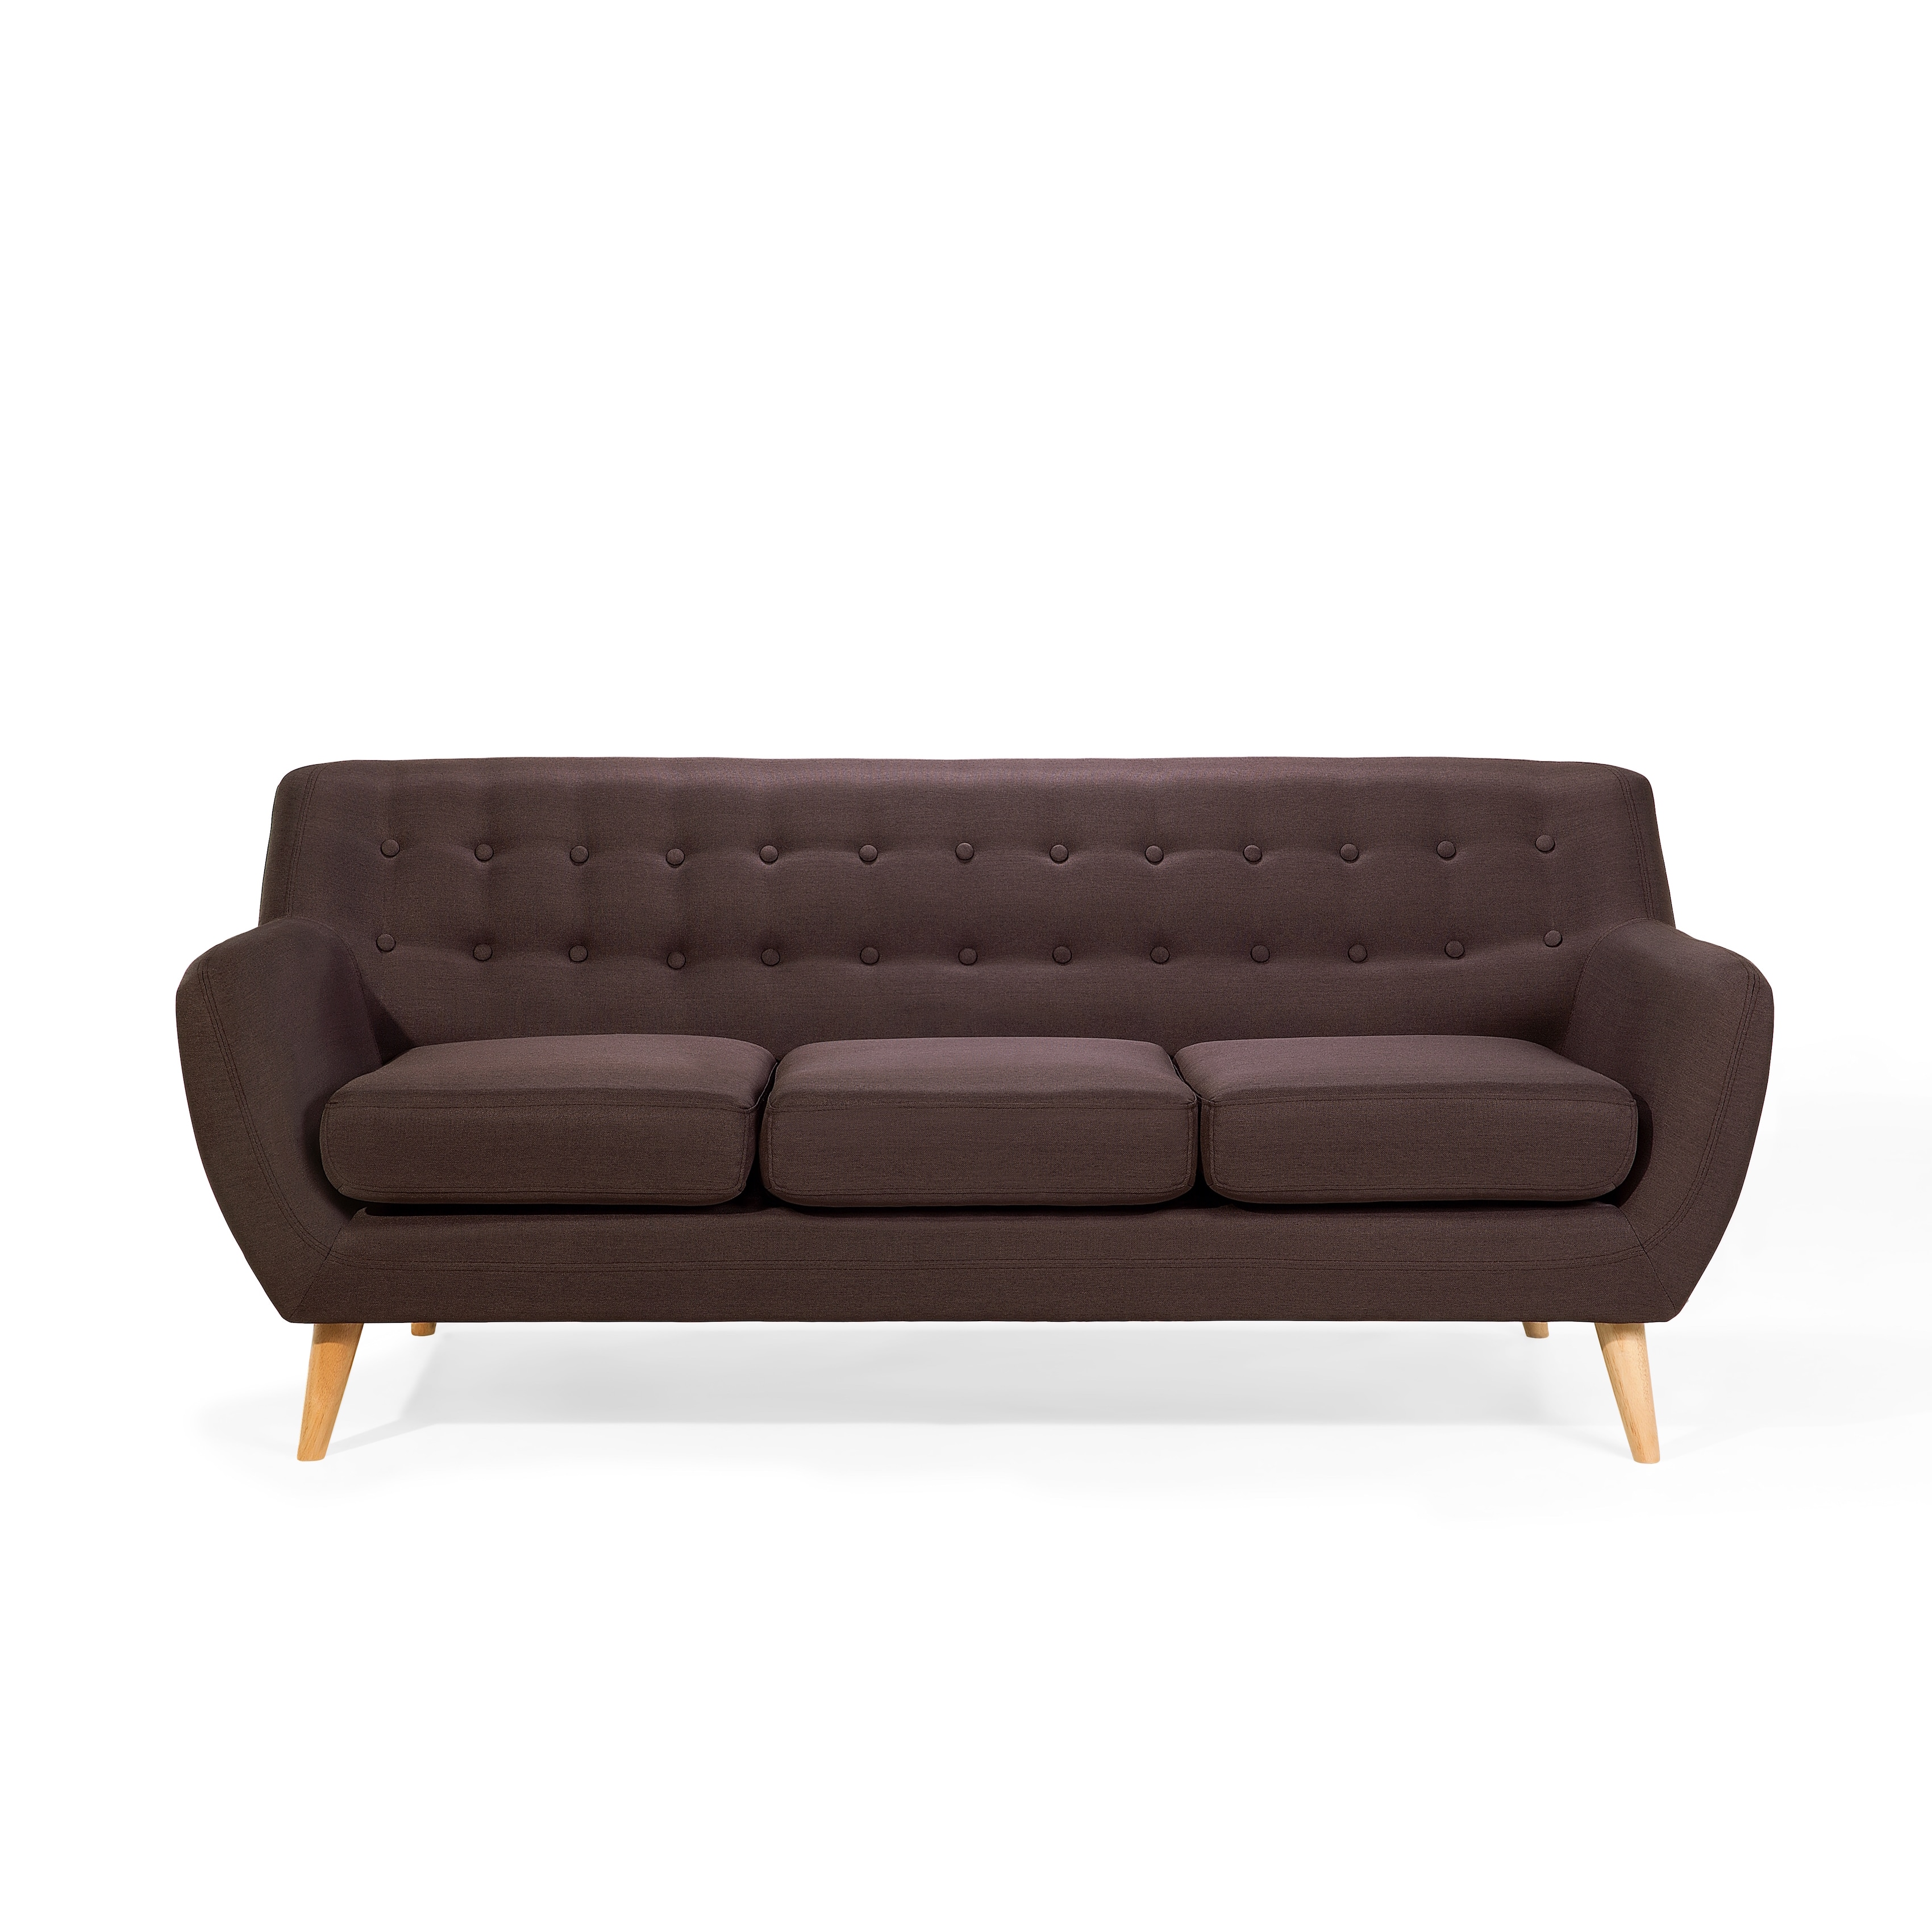 Captivating Mid Century Modern Tufted Sofa MODA